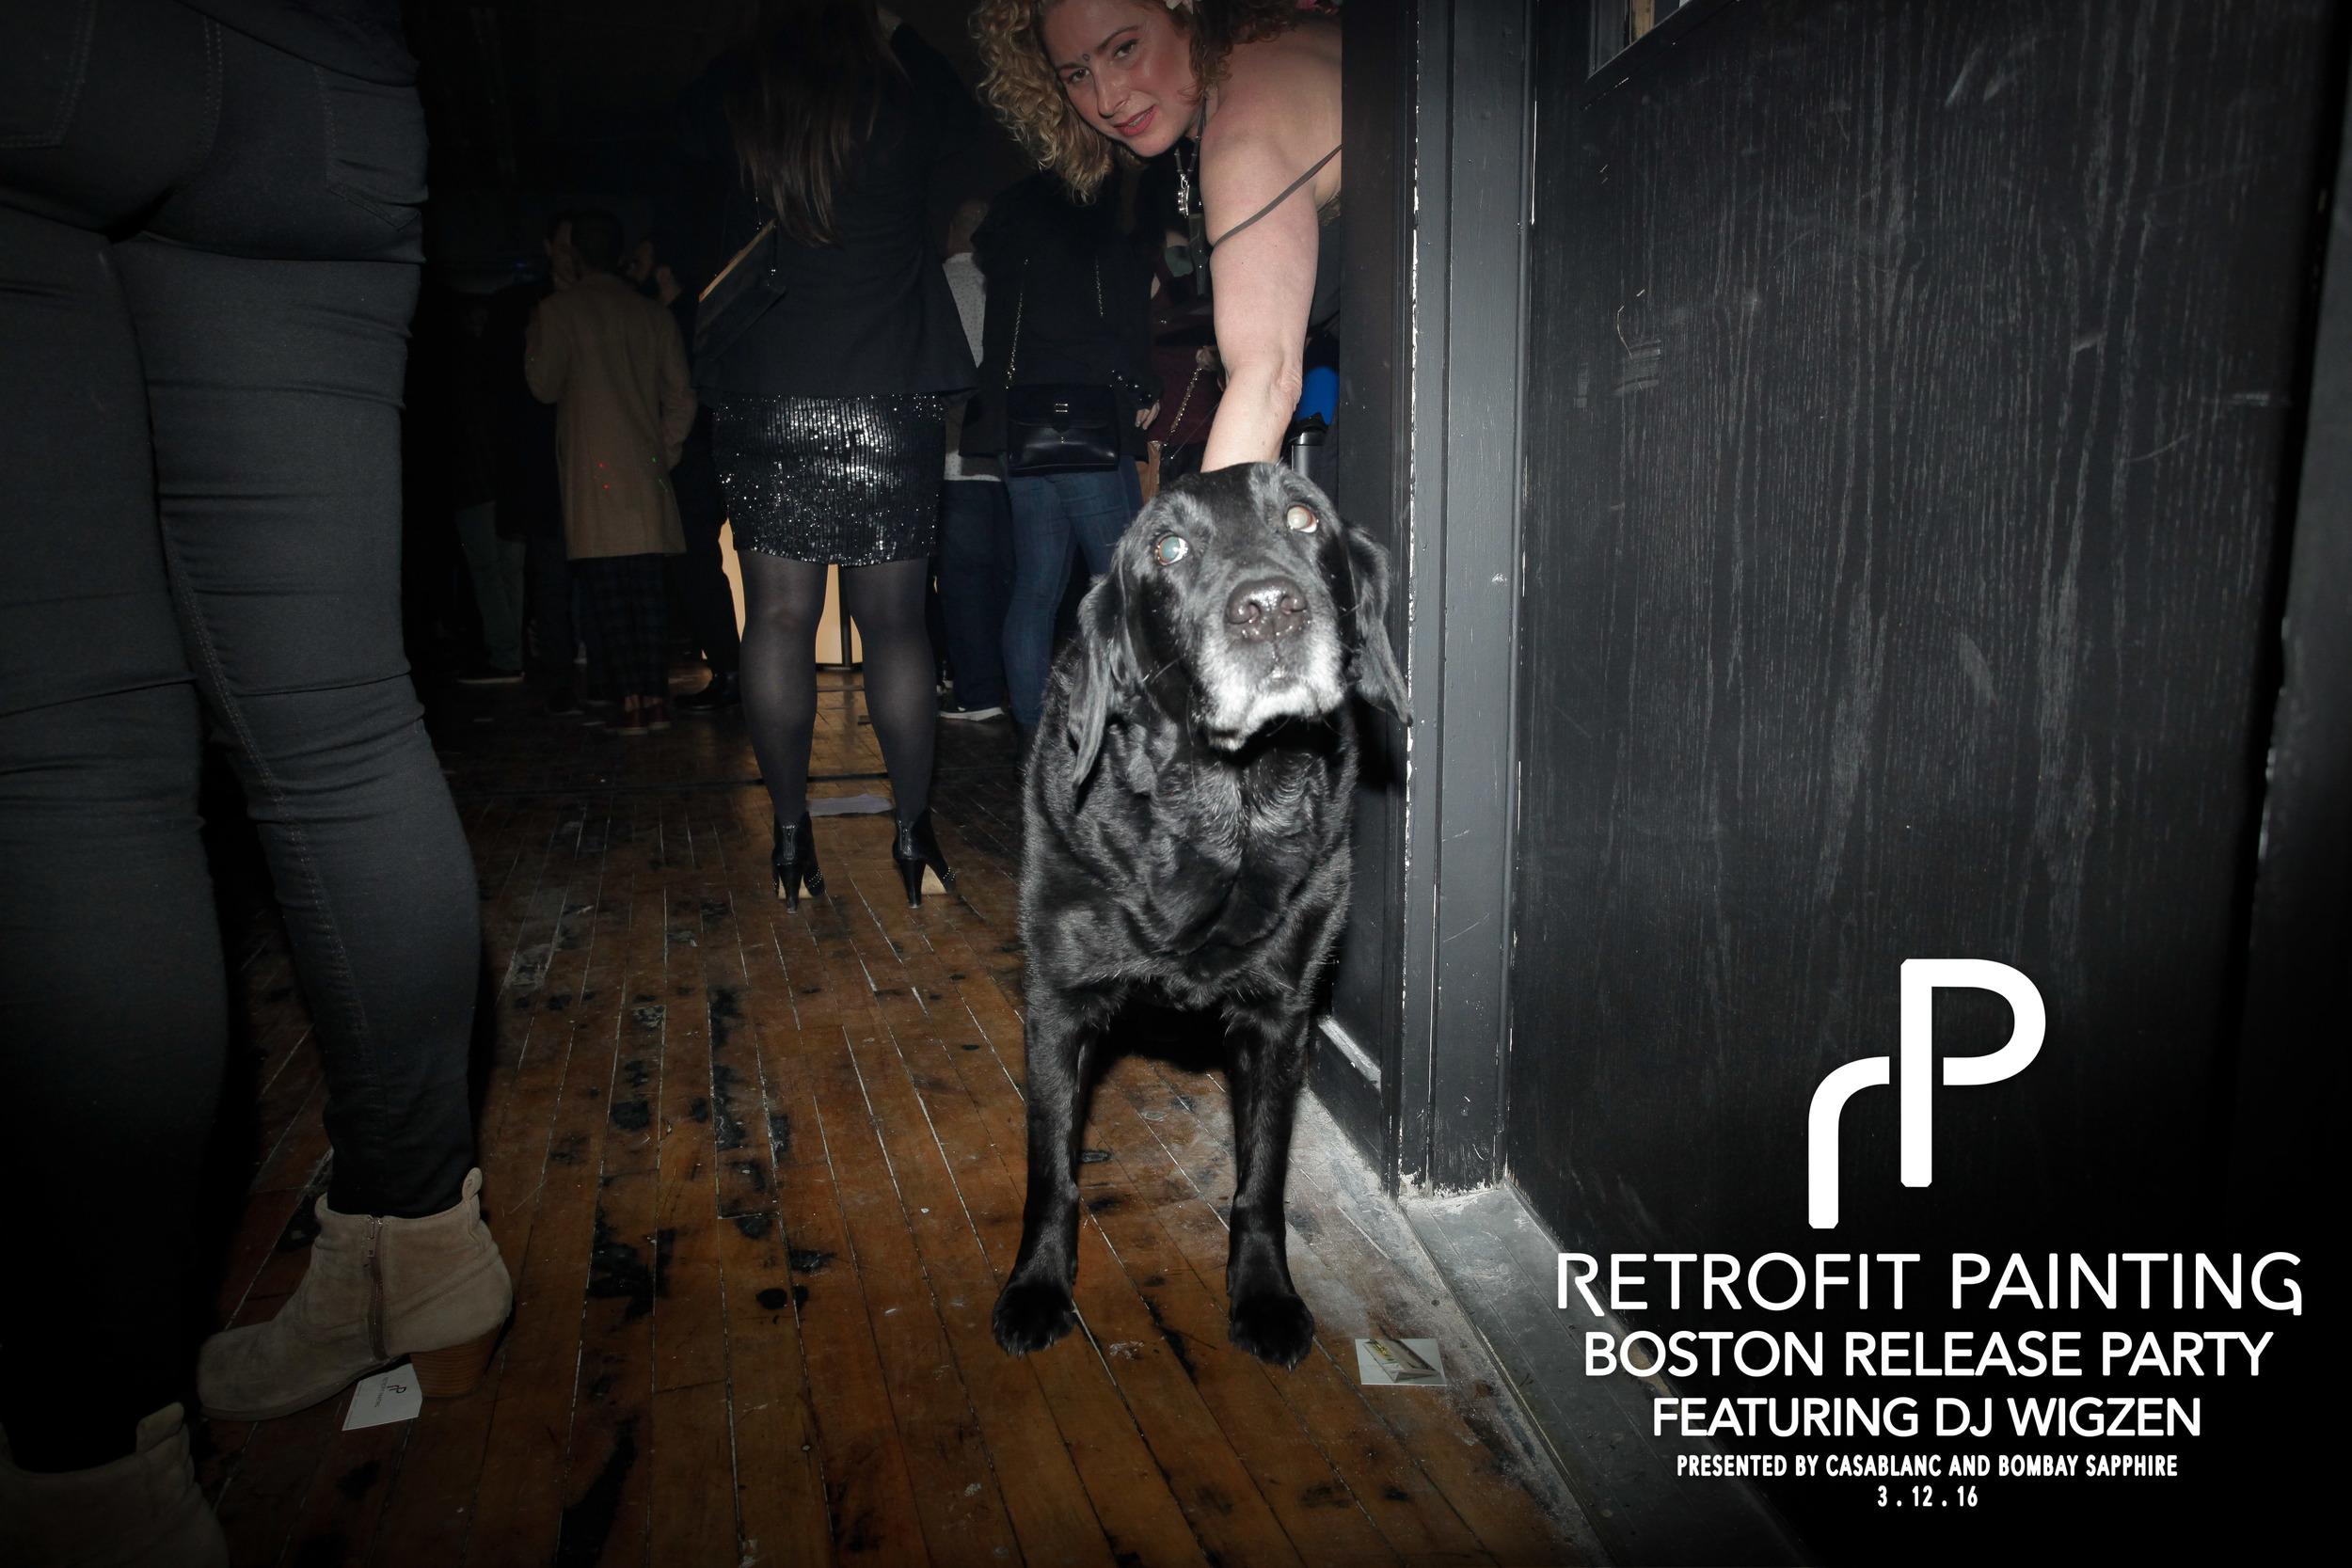 Retrofit Painting Boston Release Party 0123.jpg